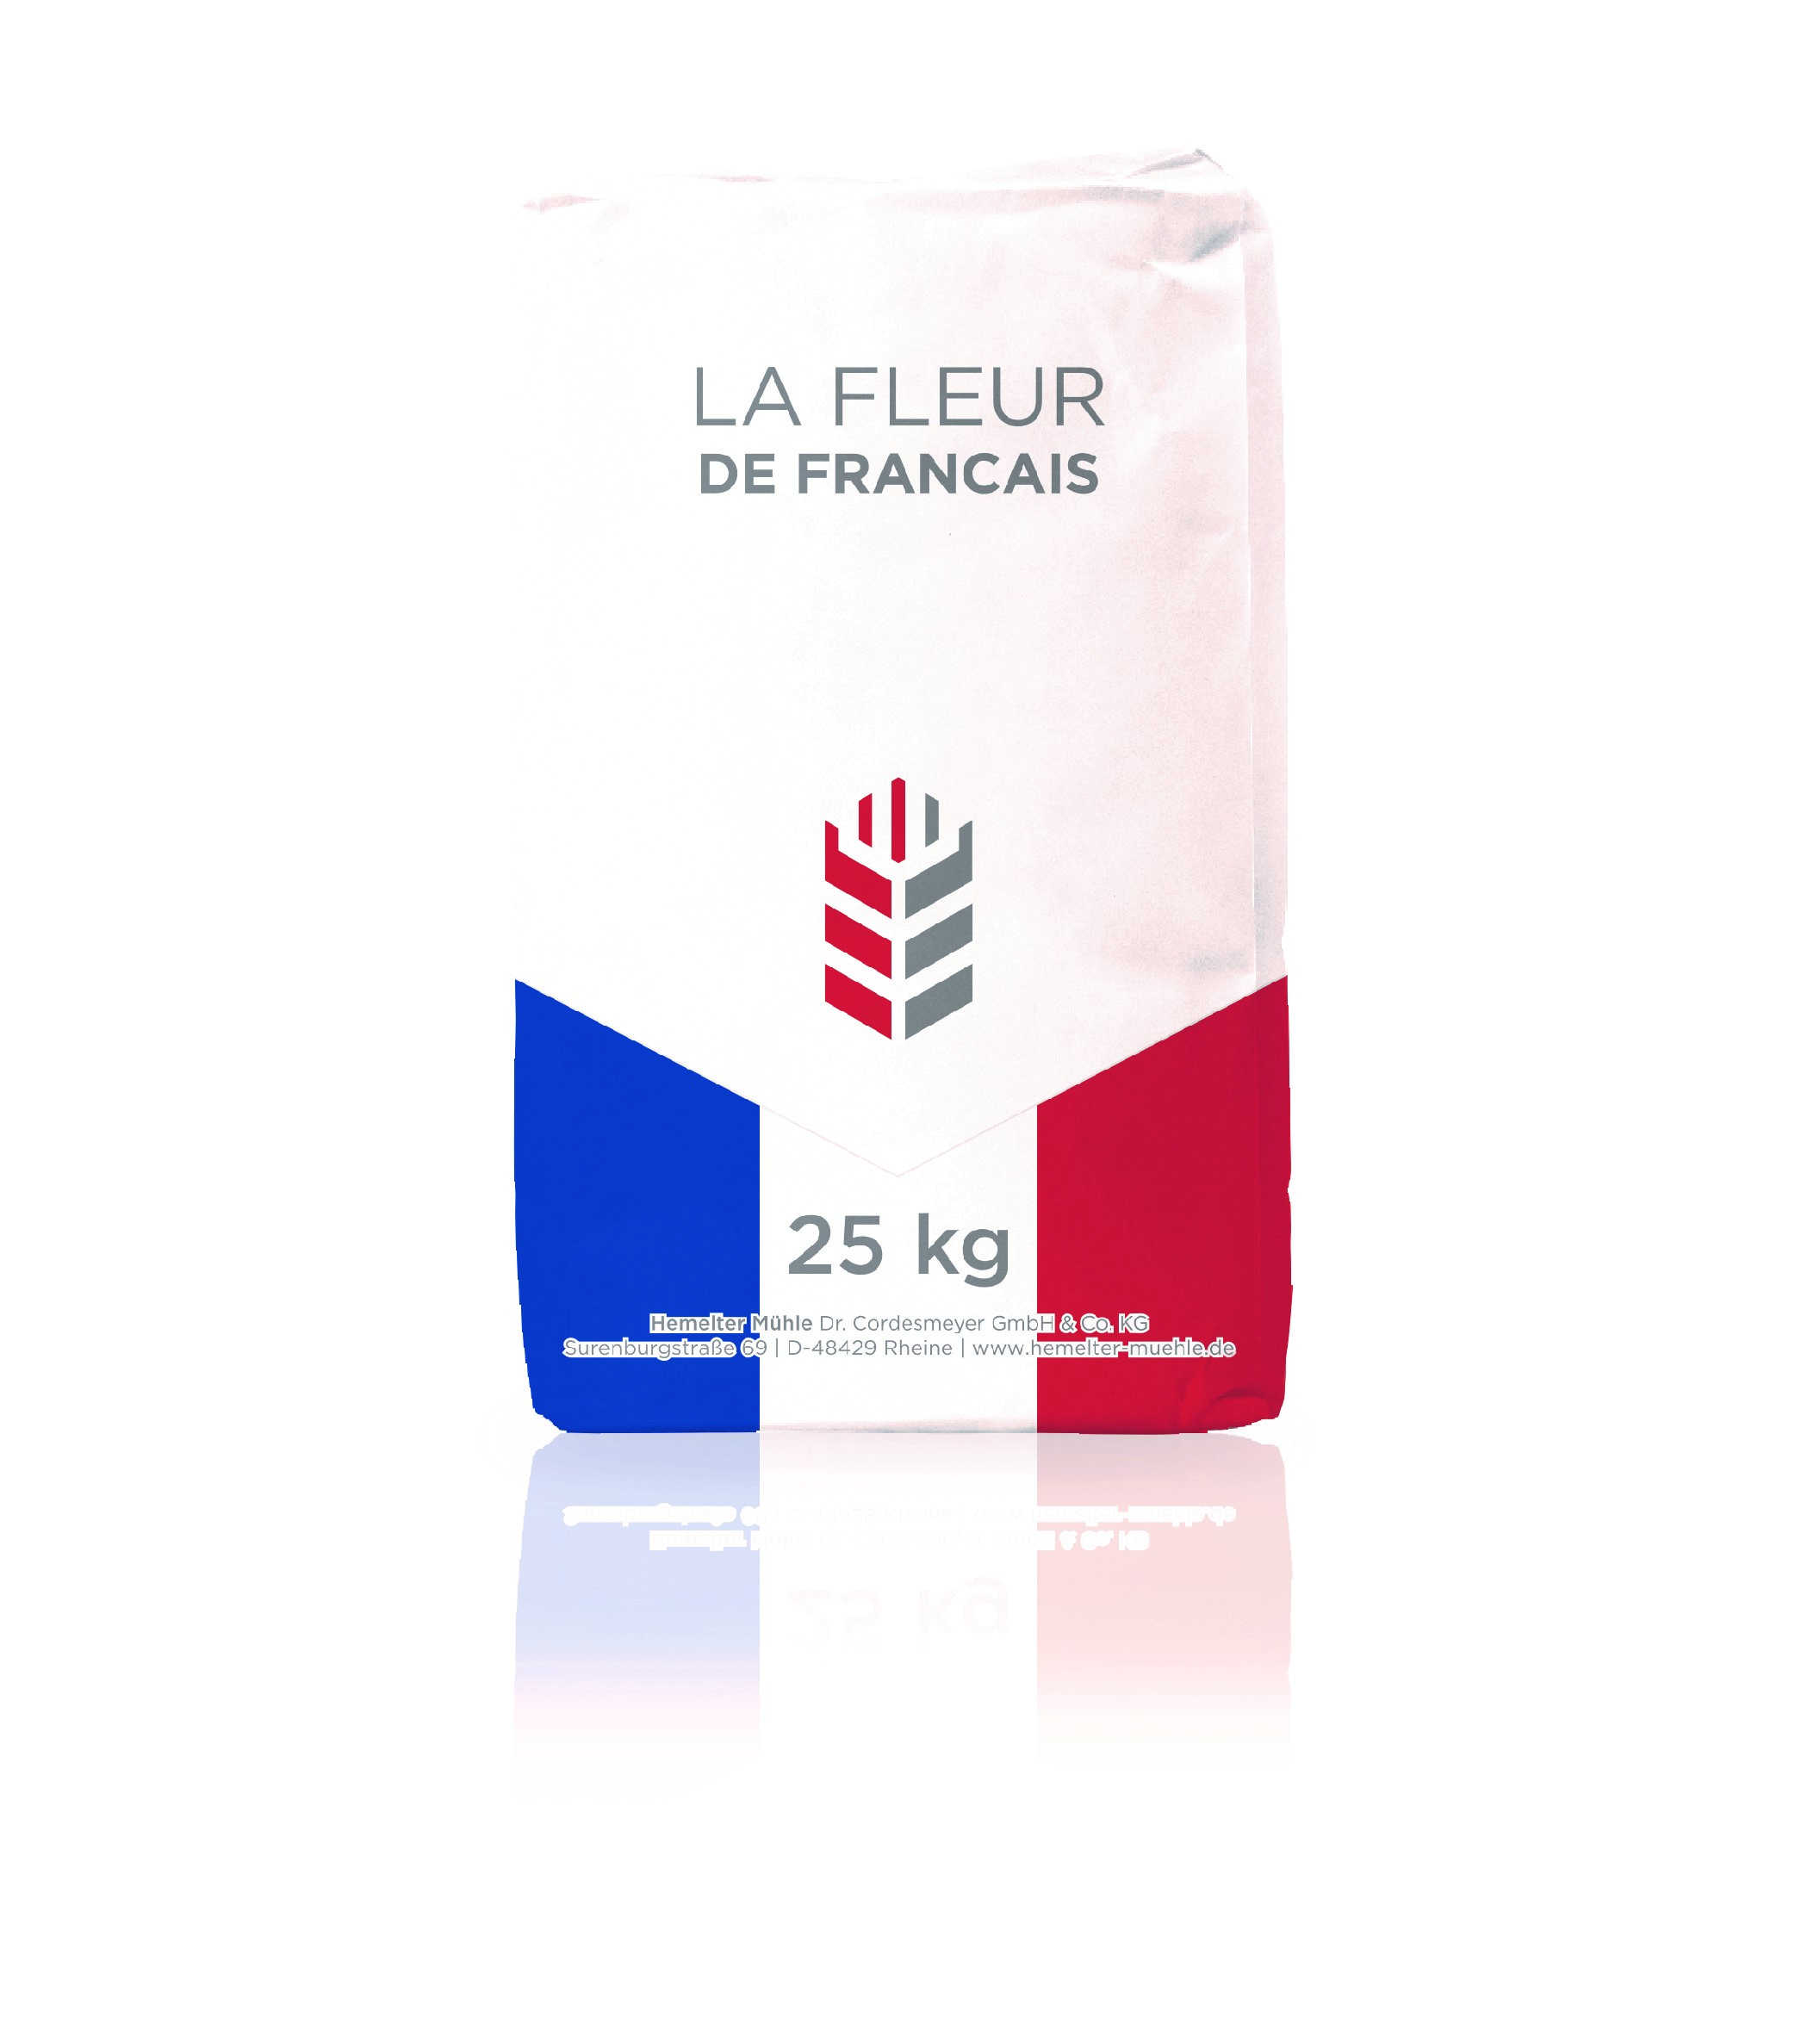 Sackabbildung La Fleur de Francais